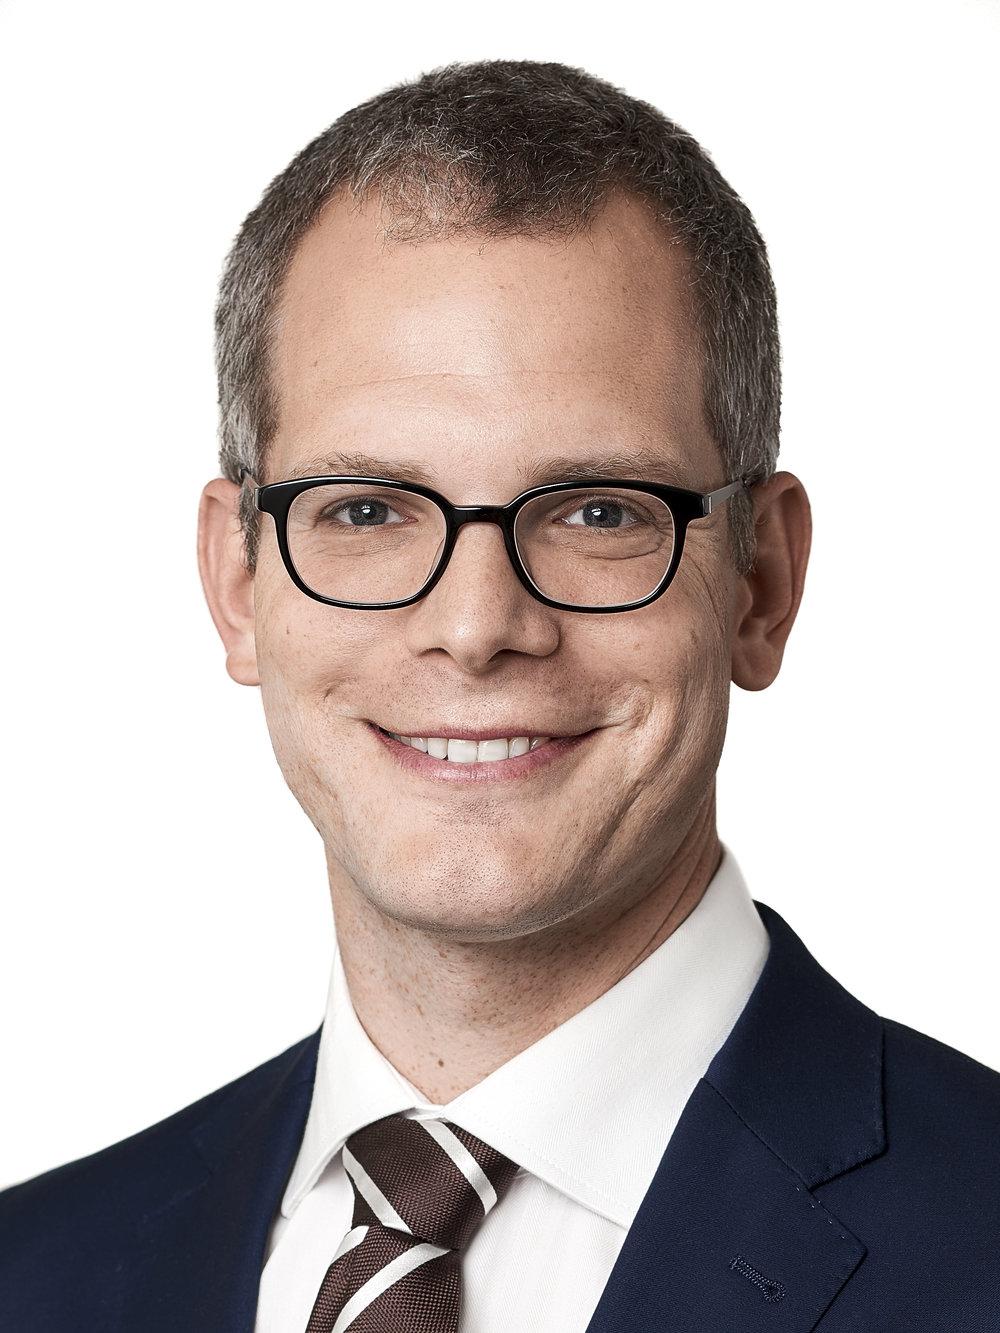 Dominic Hoffmann